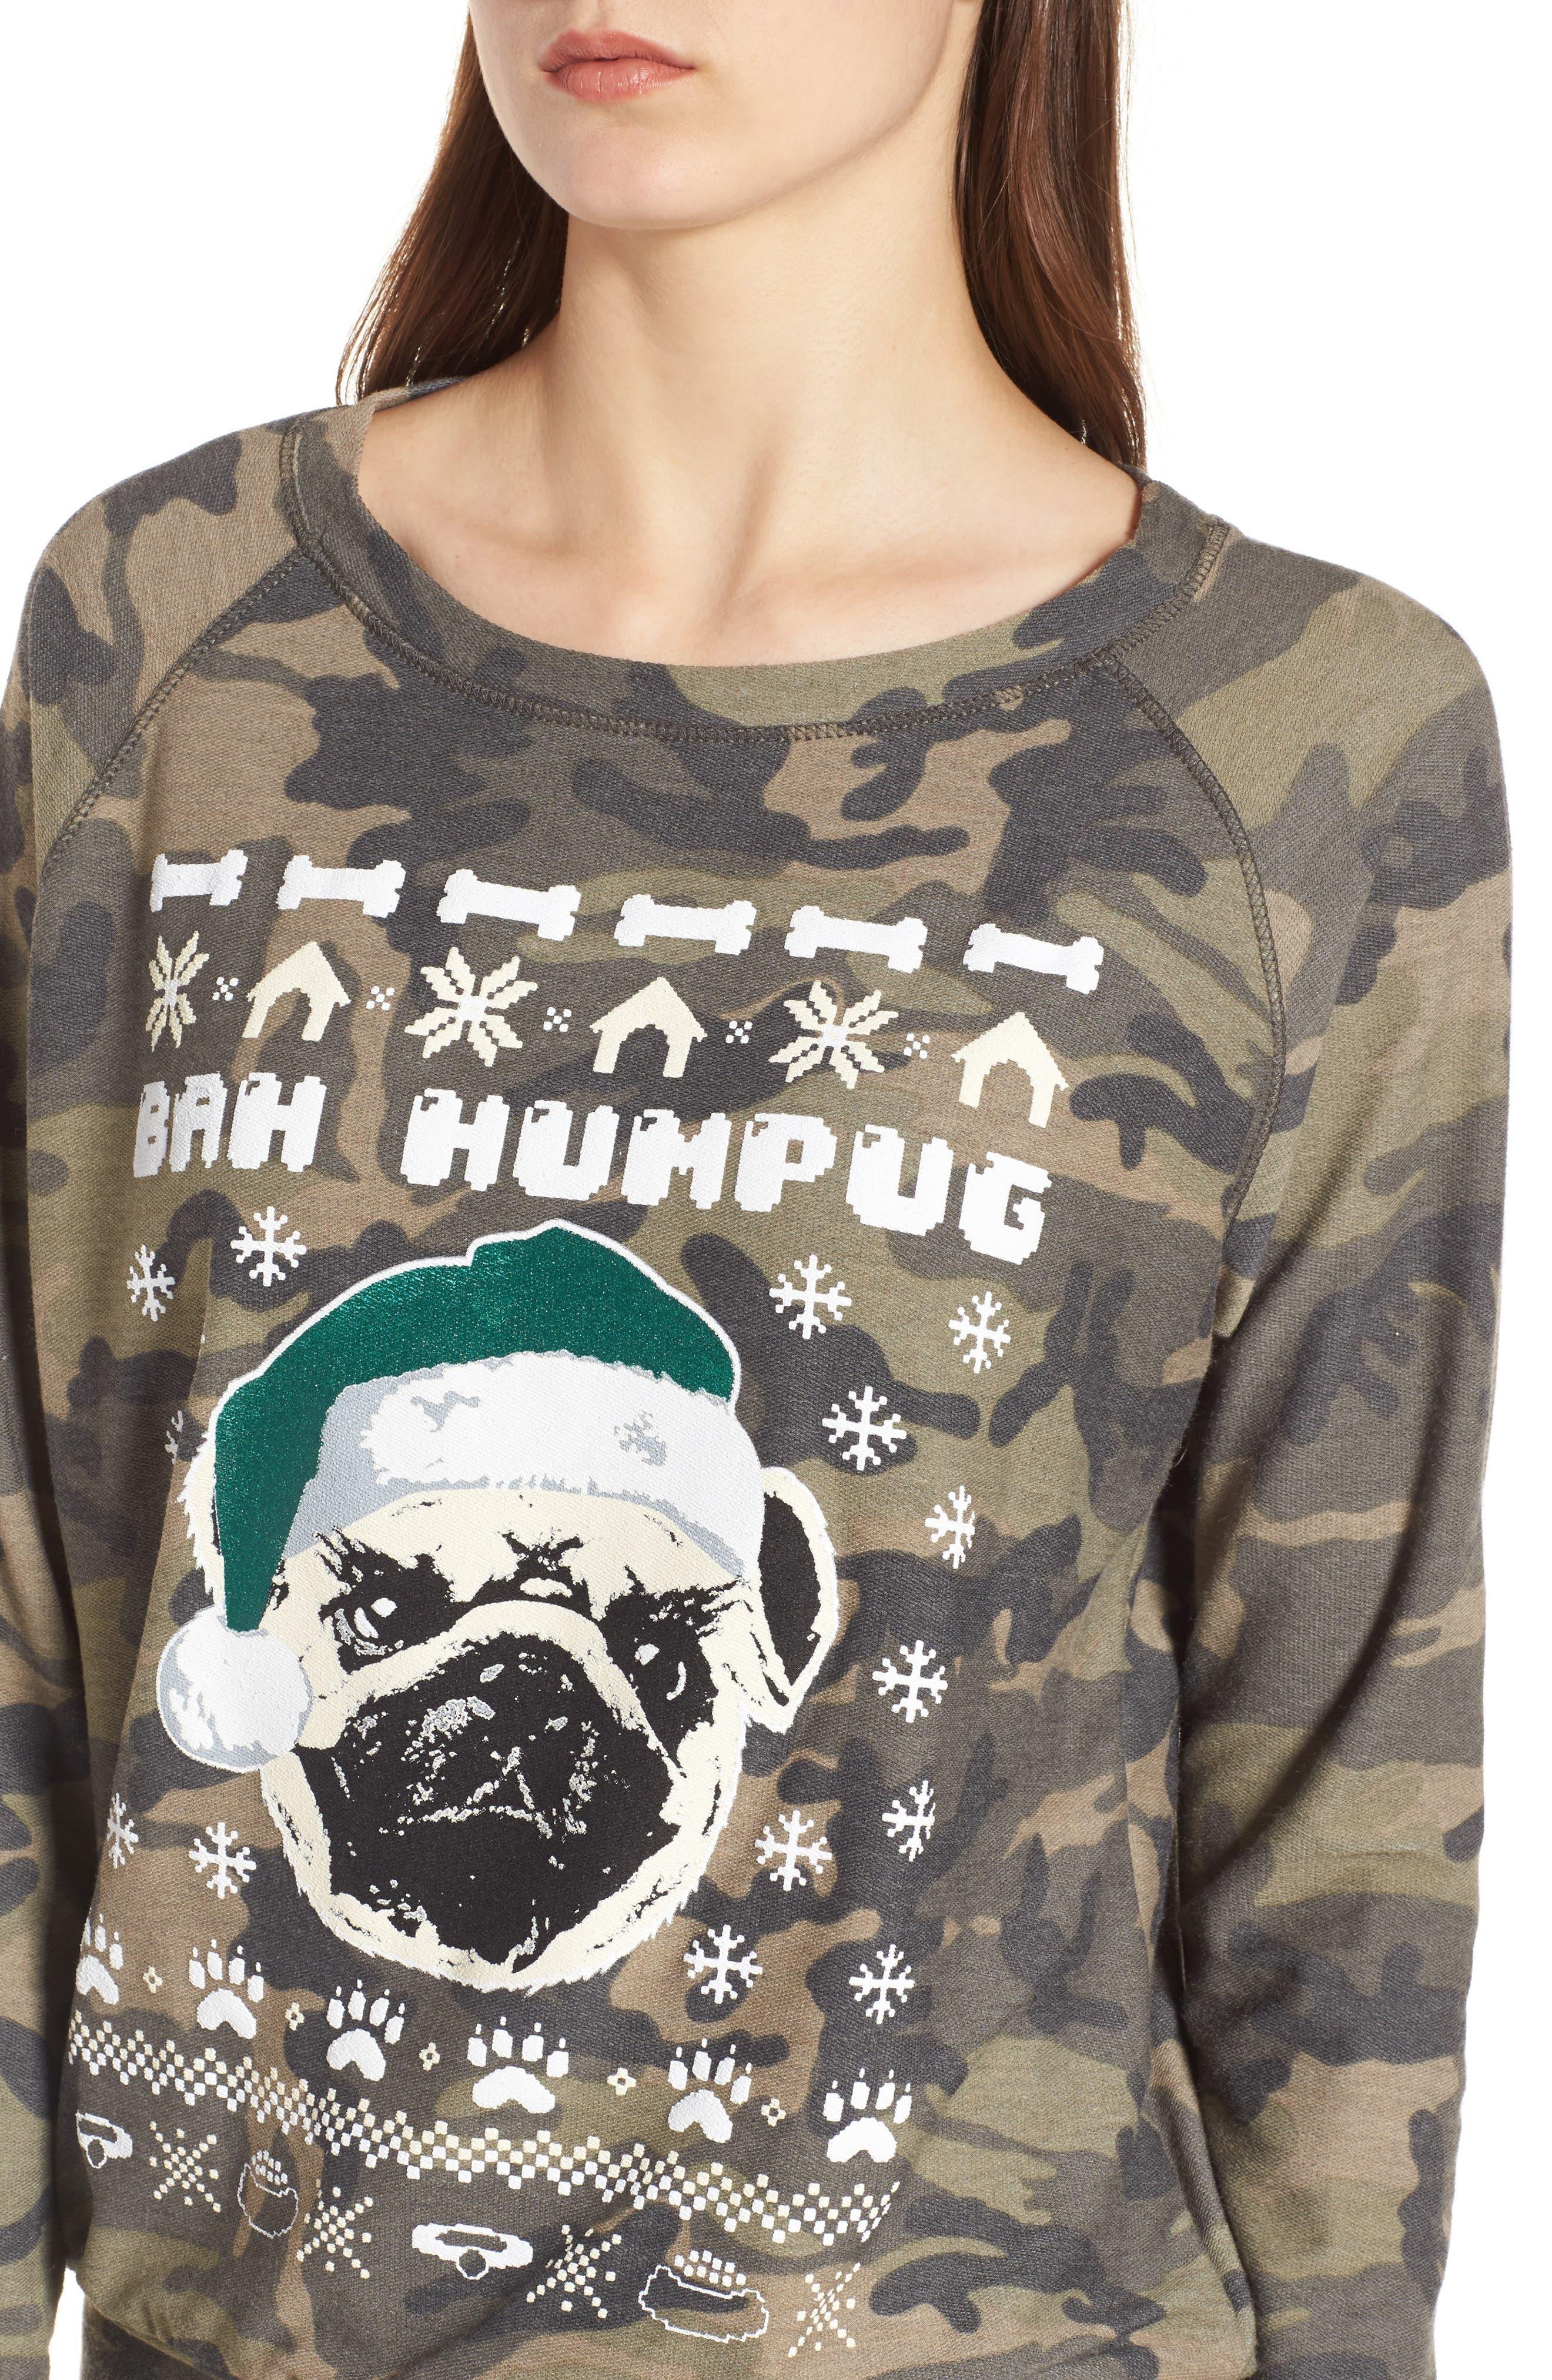 Bah Humpug Sweatshirt,                             Alternate thumbnail 4, color,                             300